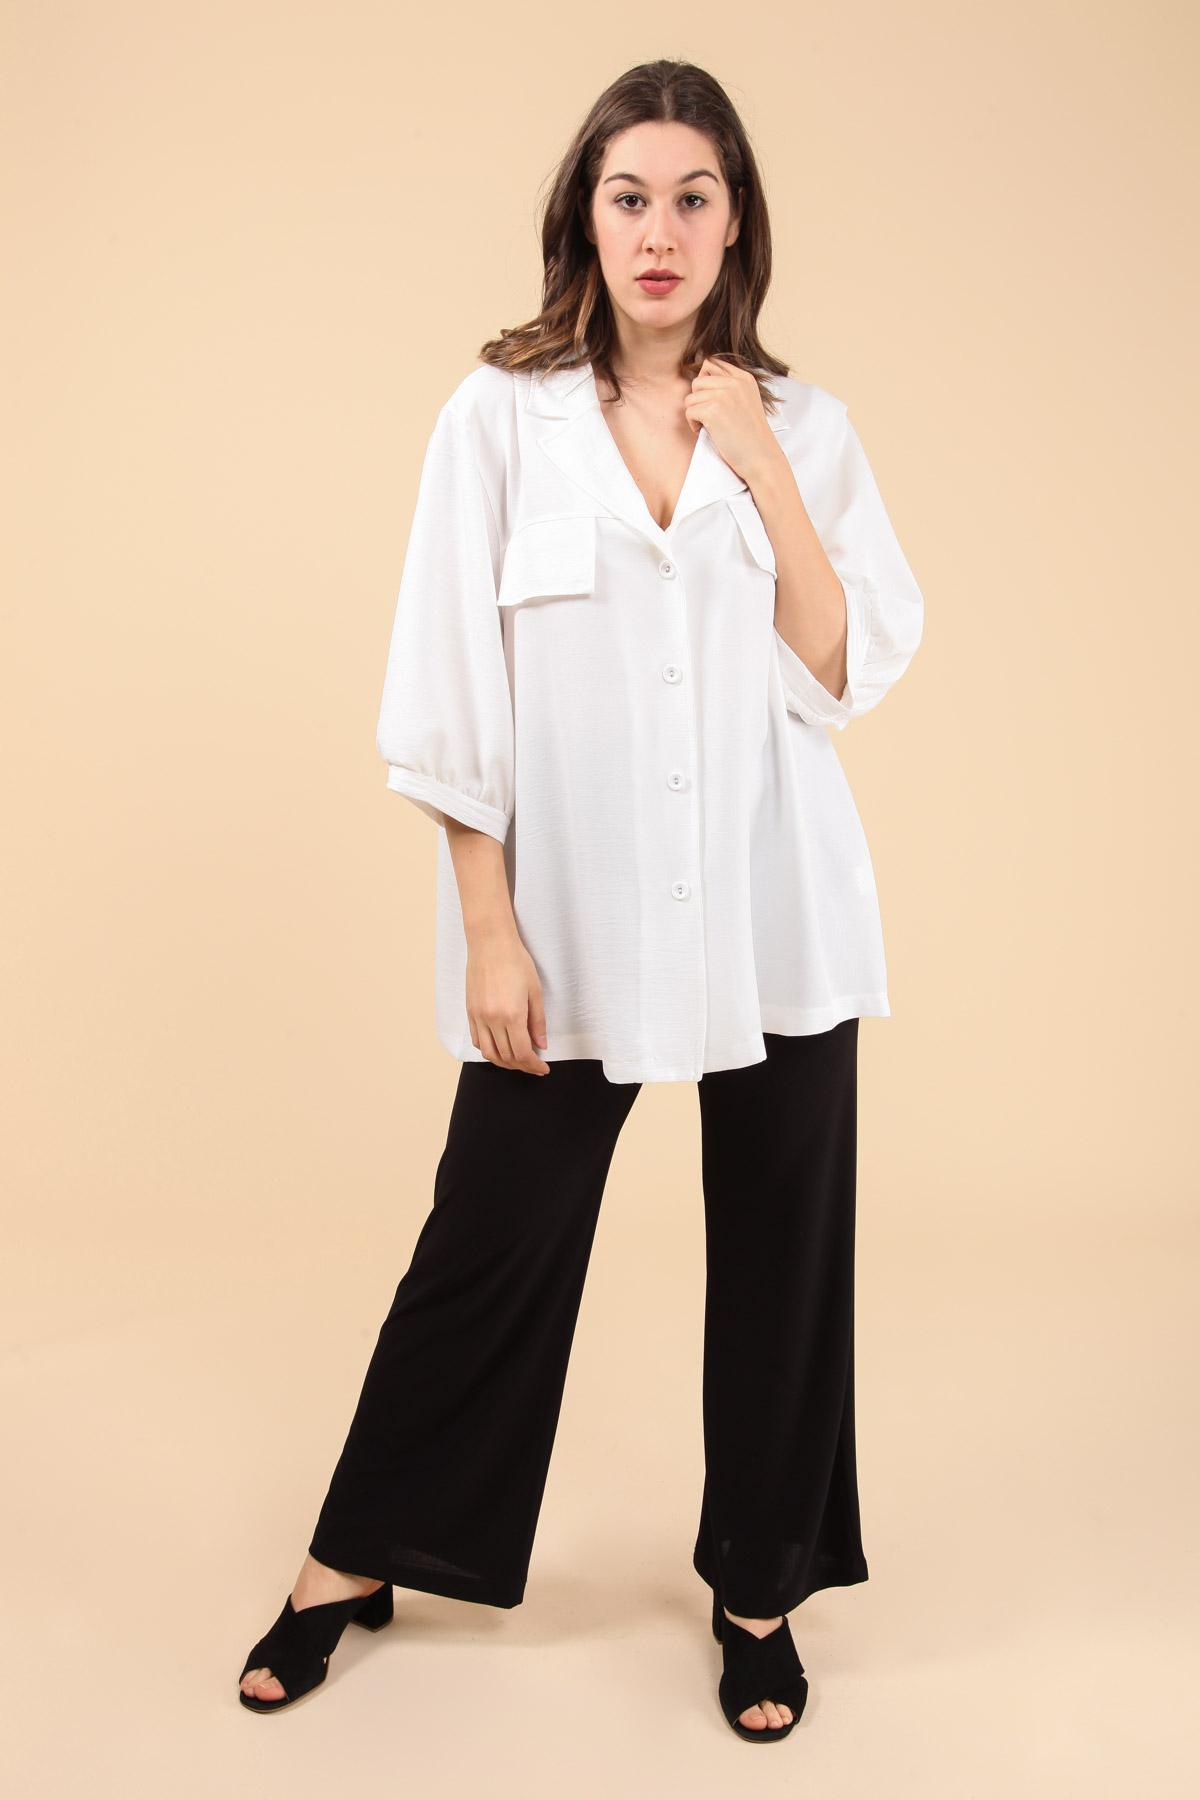 chemise grande taille femme 2W PARIS c1321 blanc 46-60